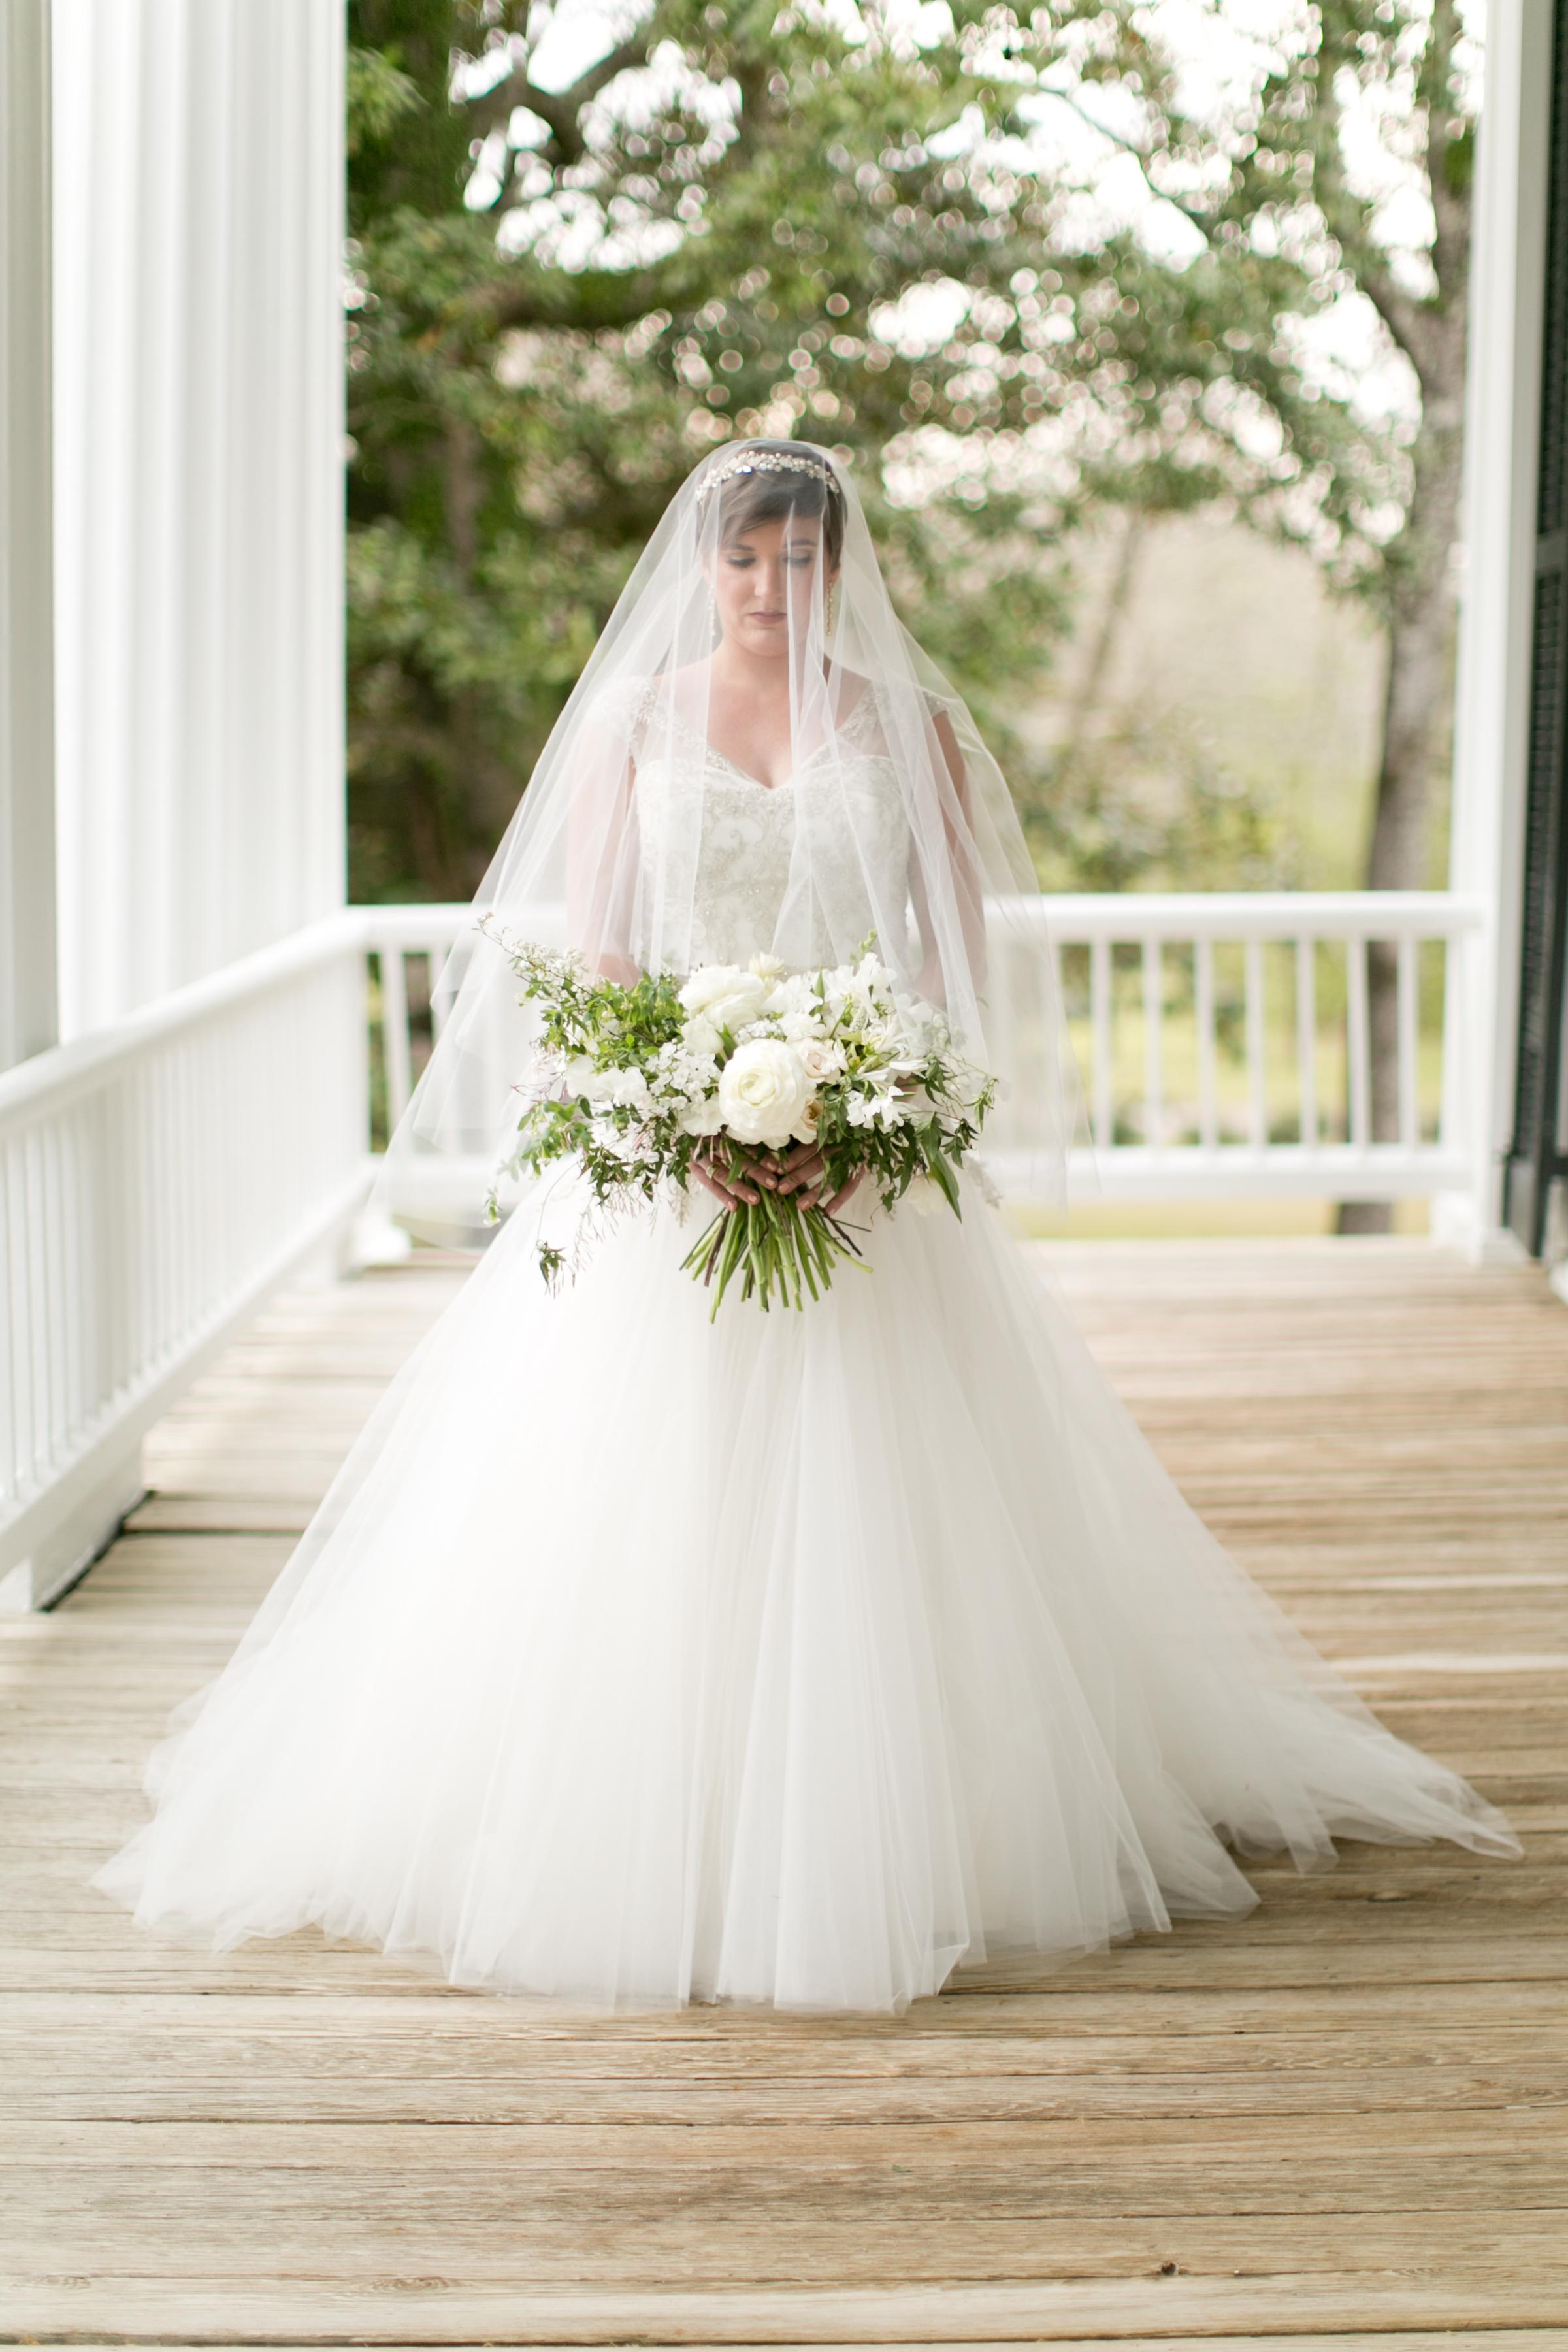 wavering_place_wedding27.jpg